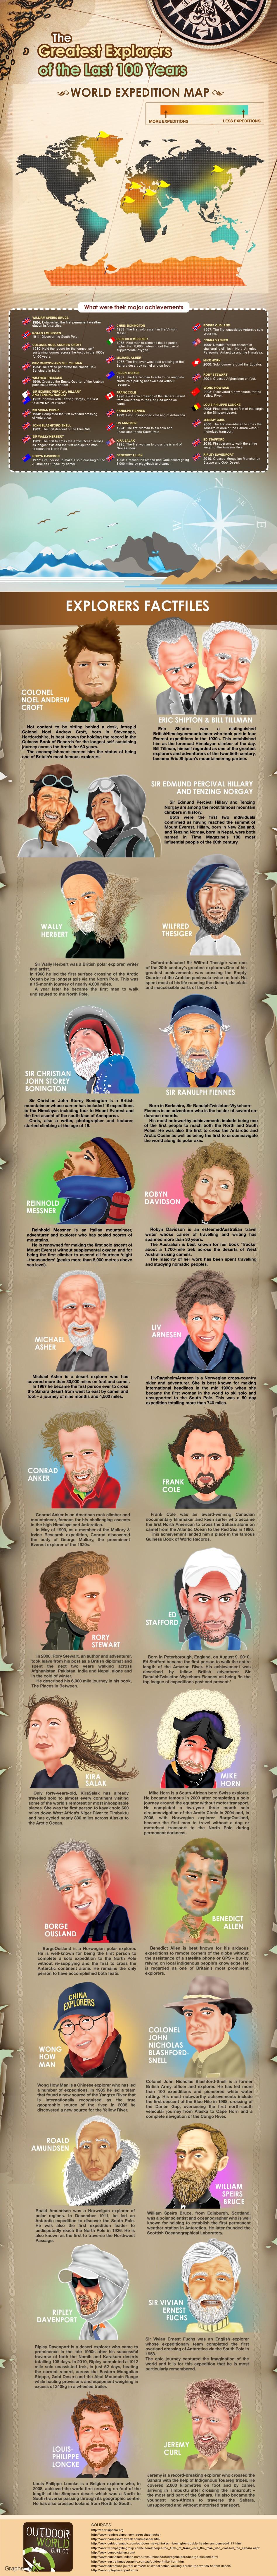 World's Greatest Explorers In Last 10 Decades